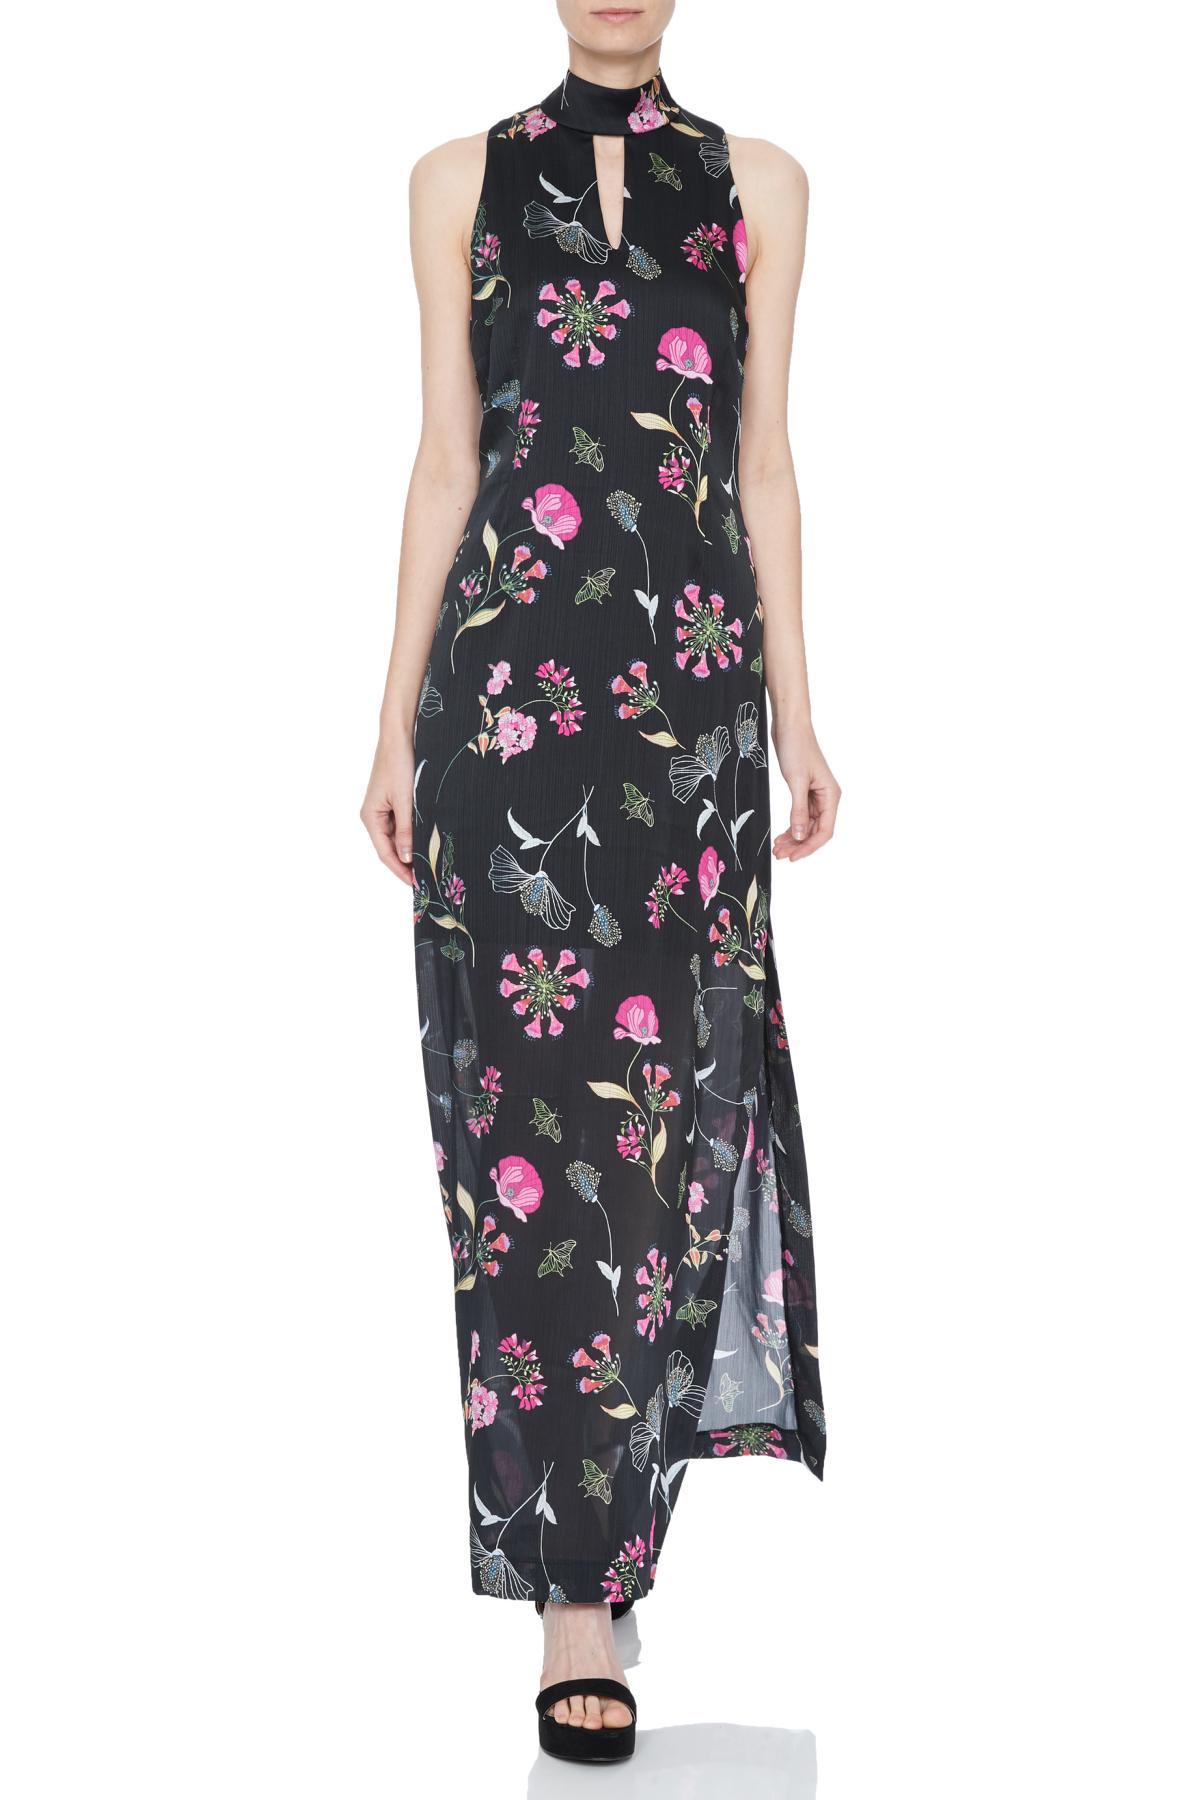 Front of Ana Alcazar Maxi Dress Nissale   worn by model